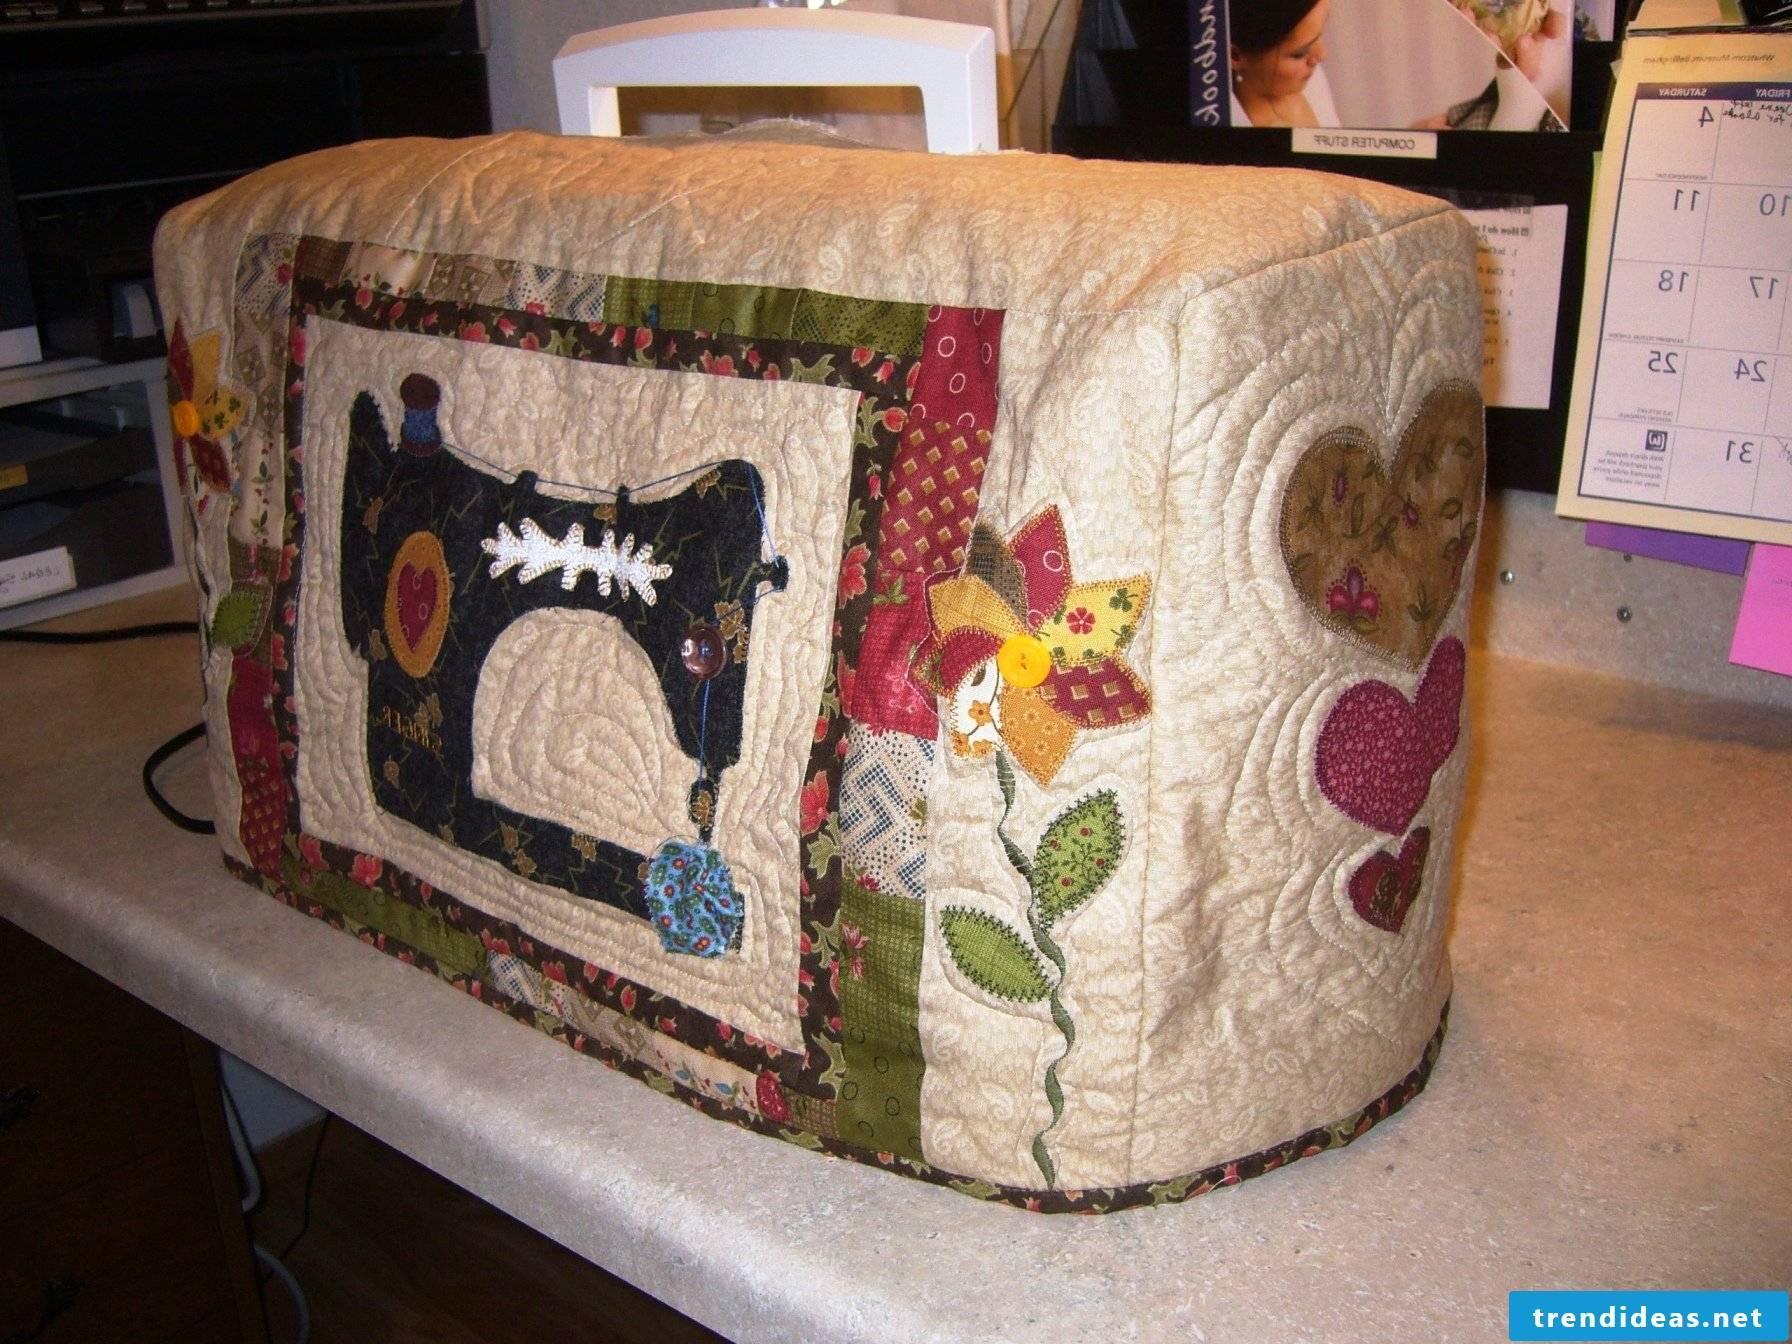 Great self-sewn hood for sewing machine